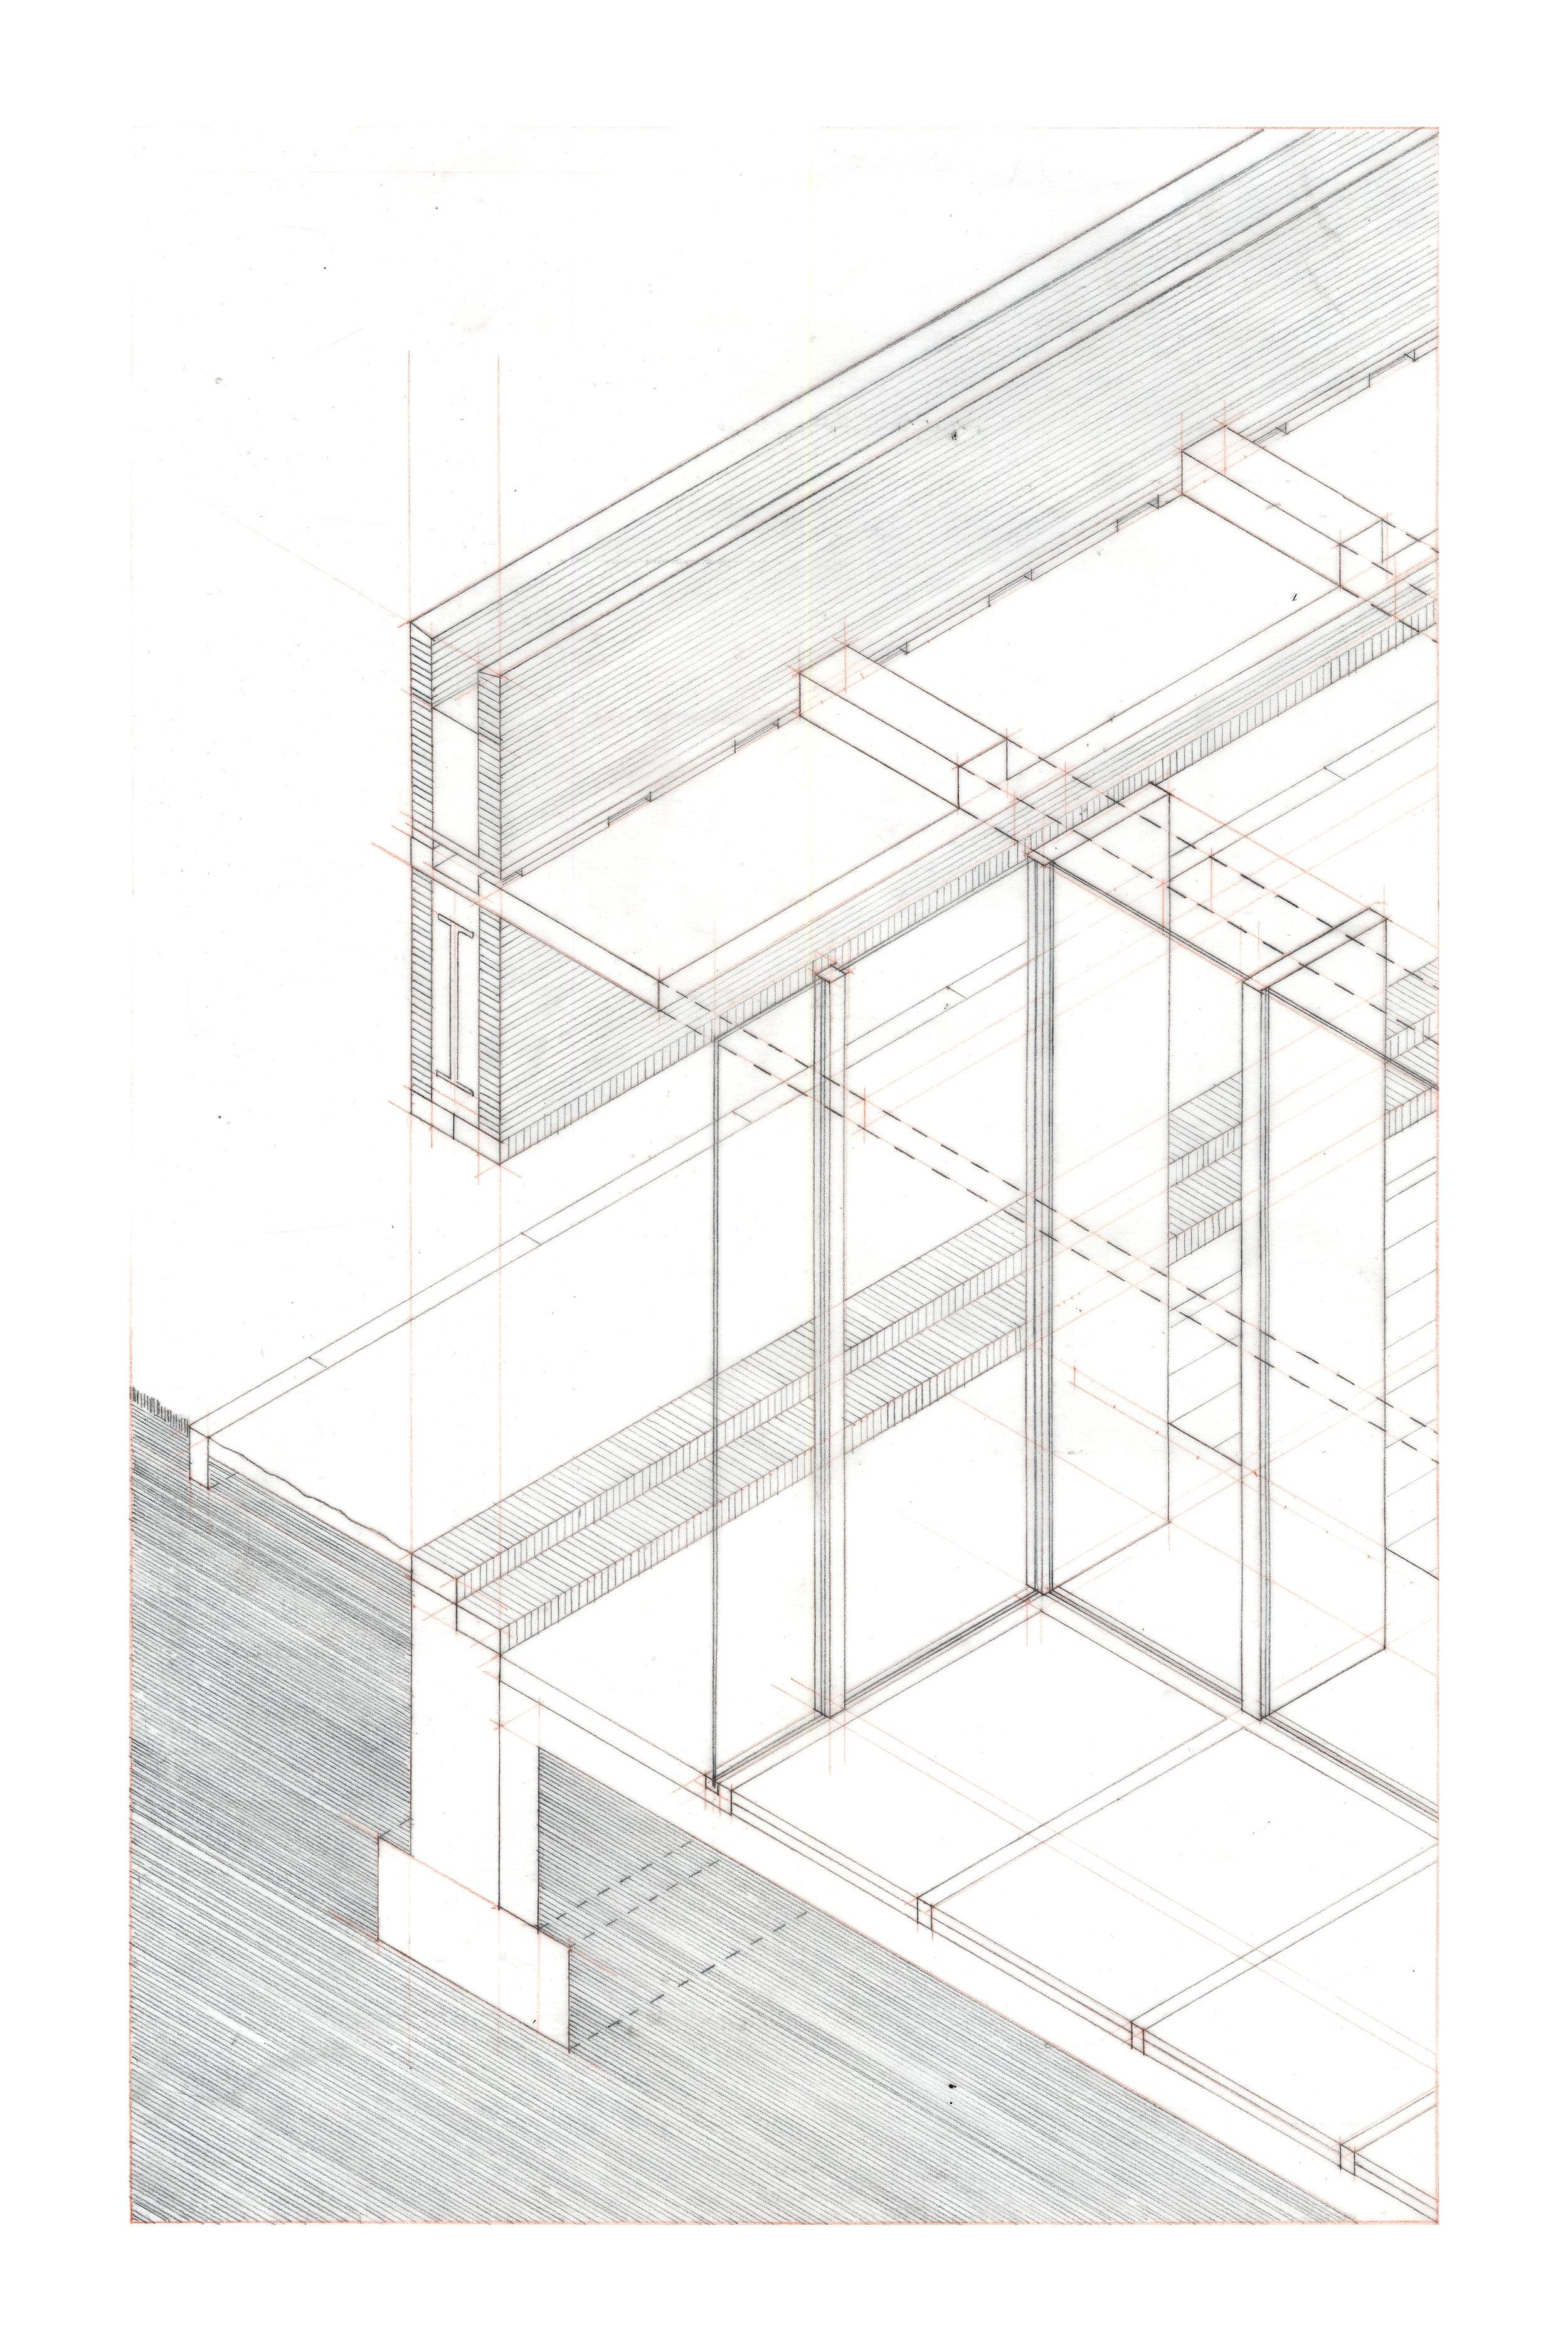 SectionIso_001.jpg